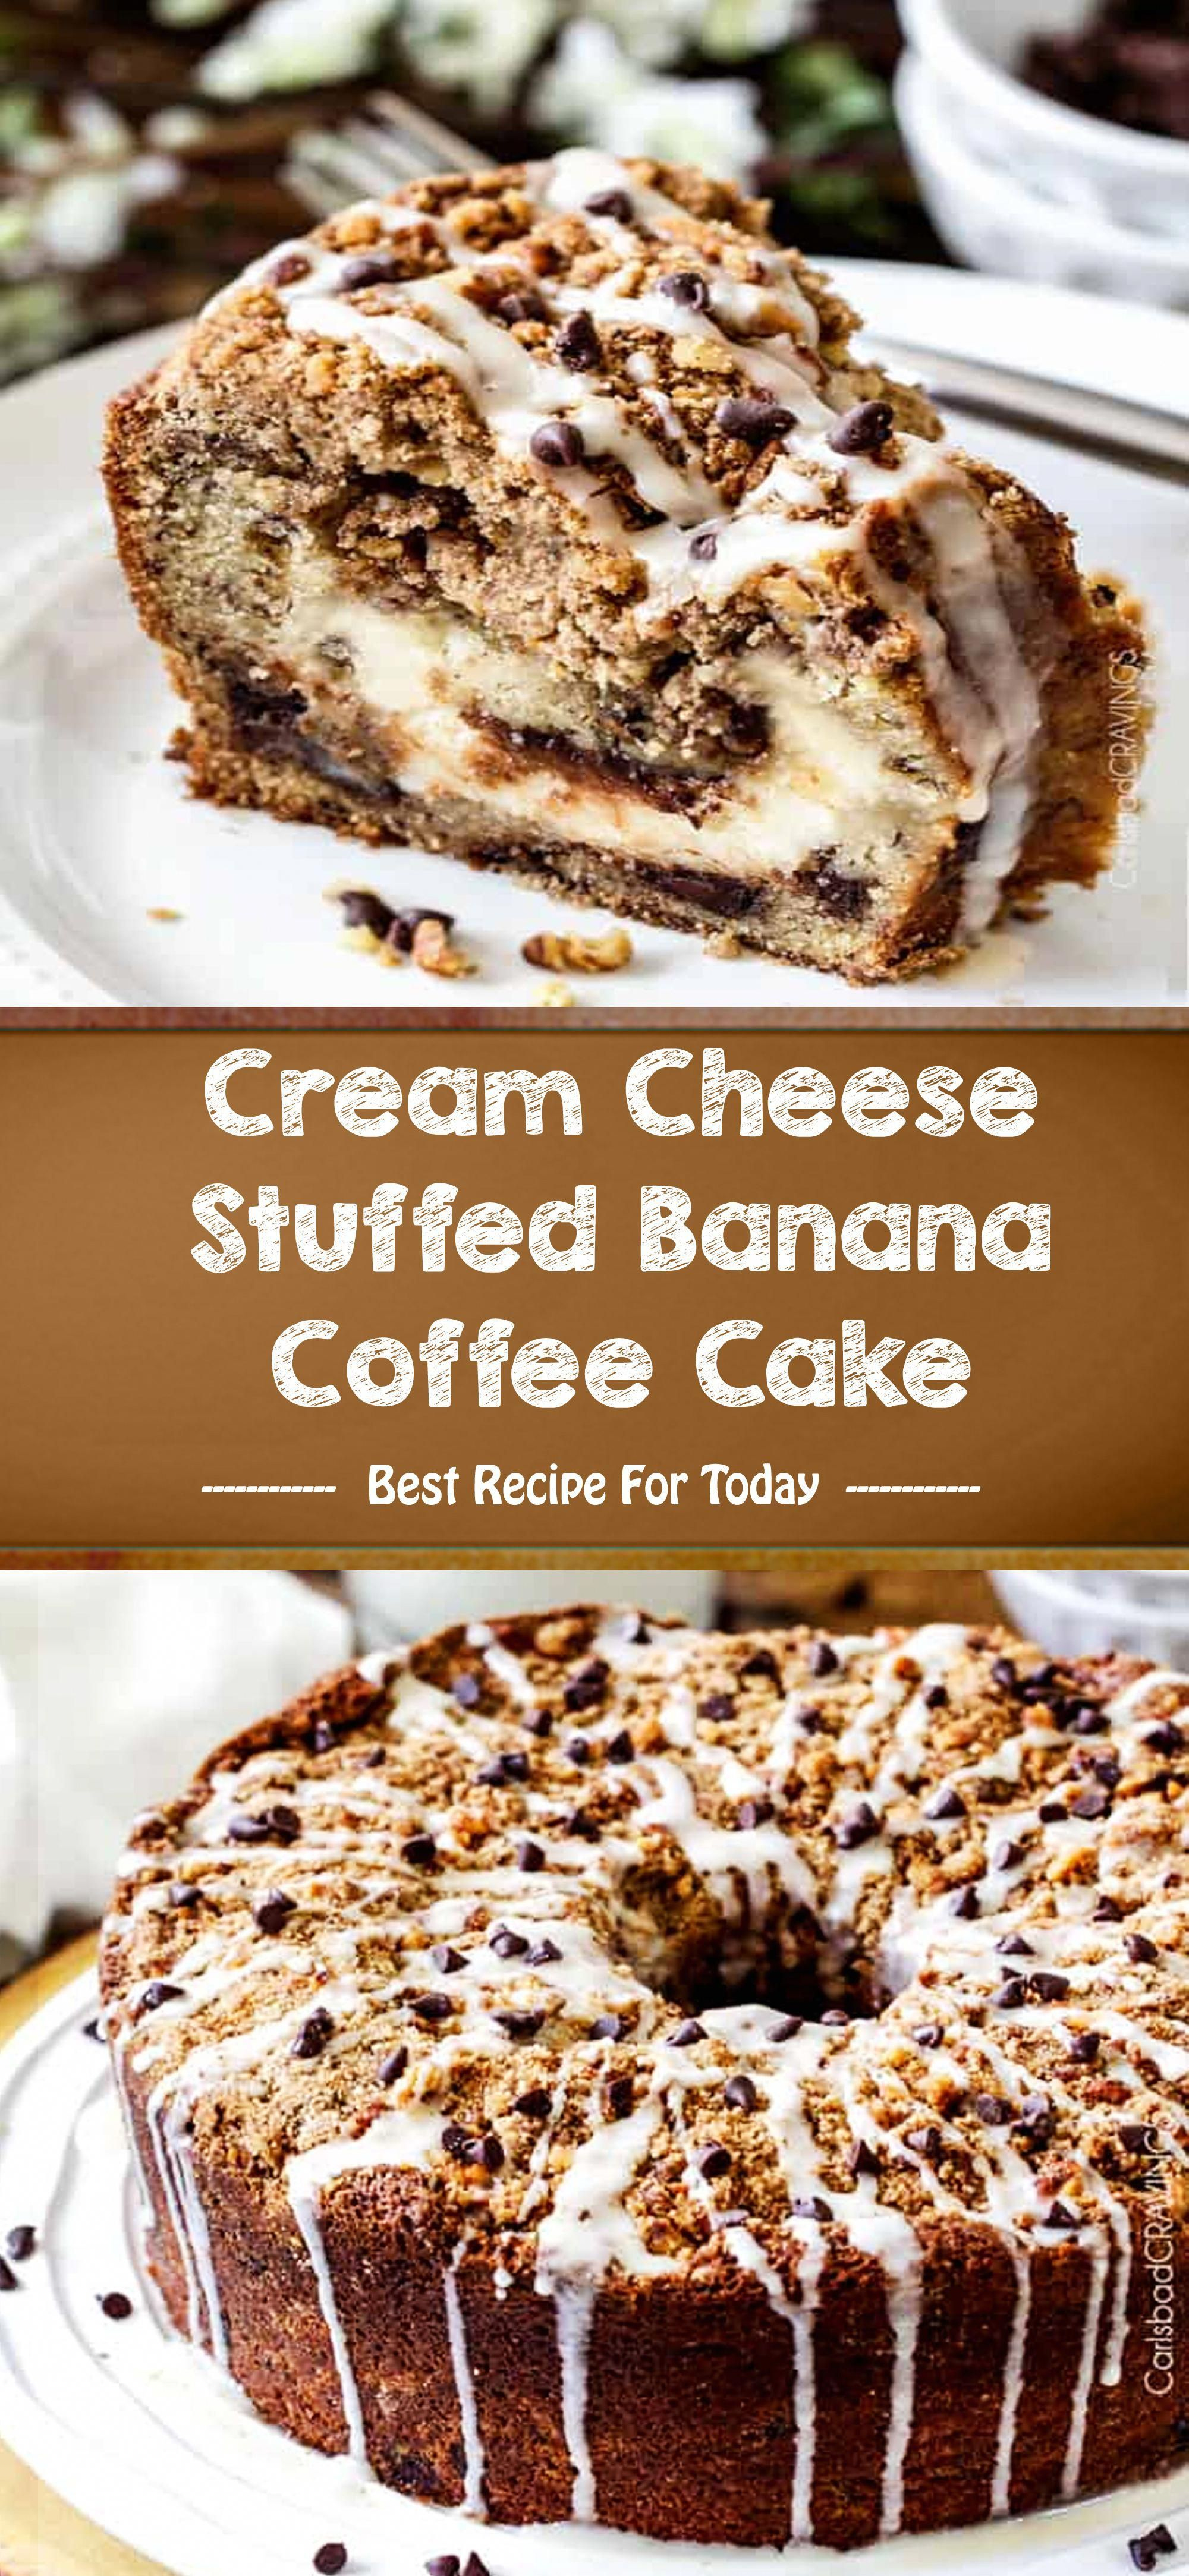 Cookeo yogurt cake hq recipes recipe in 2020 banana